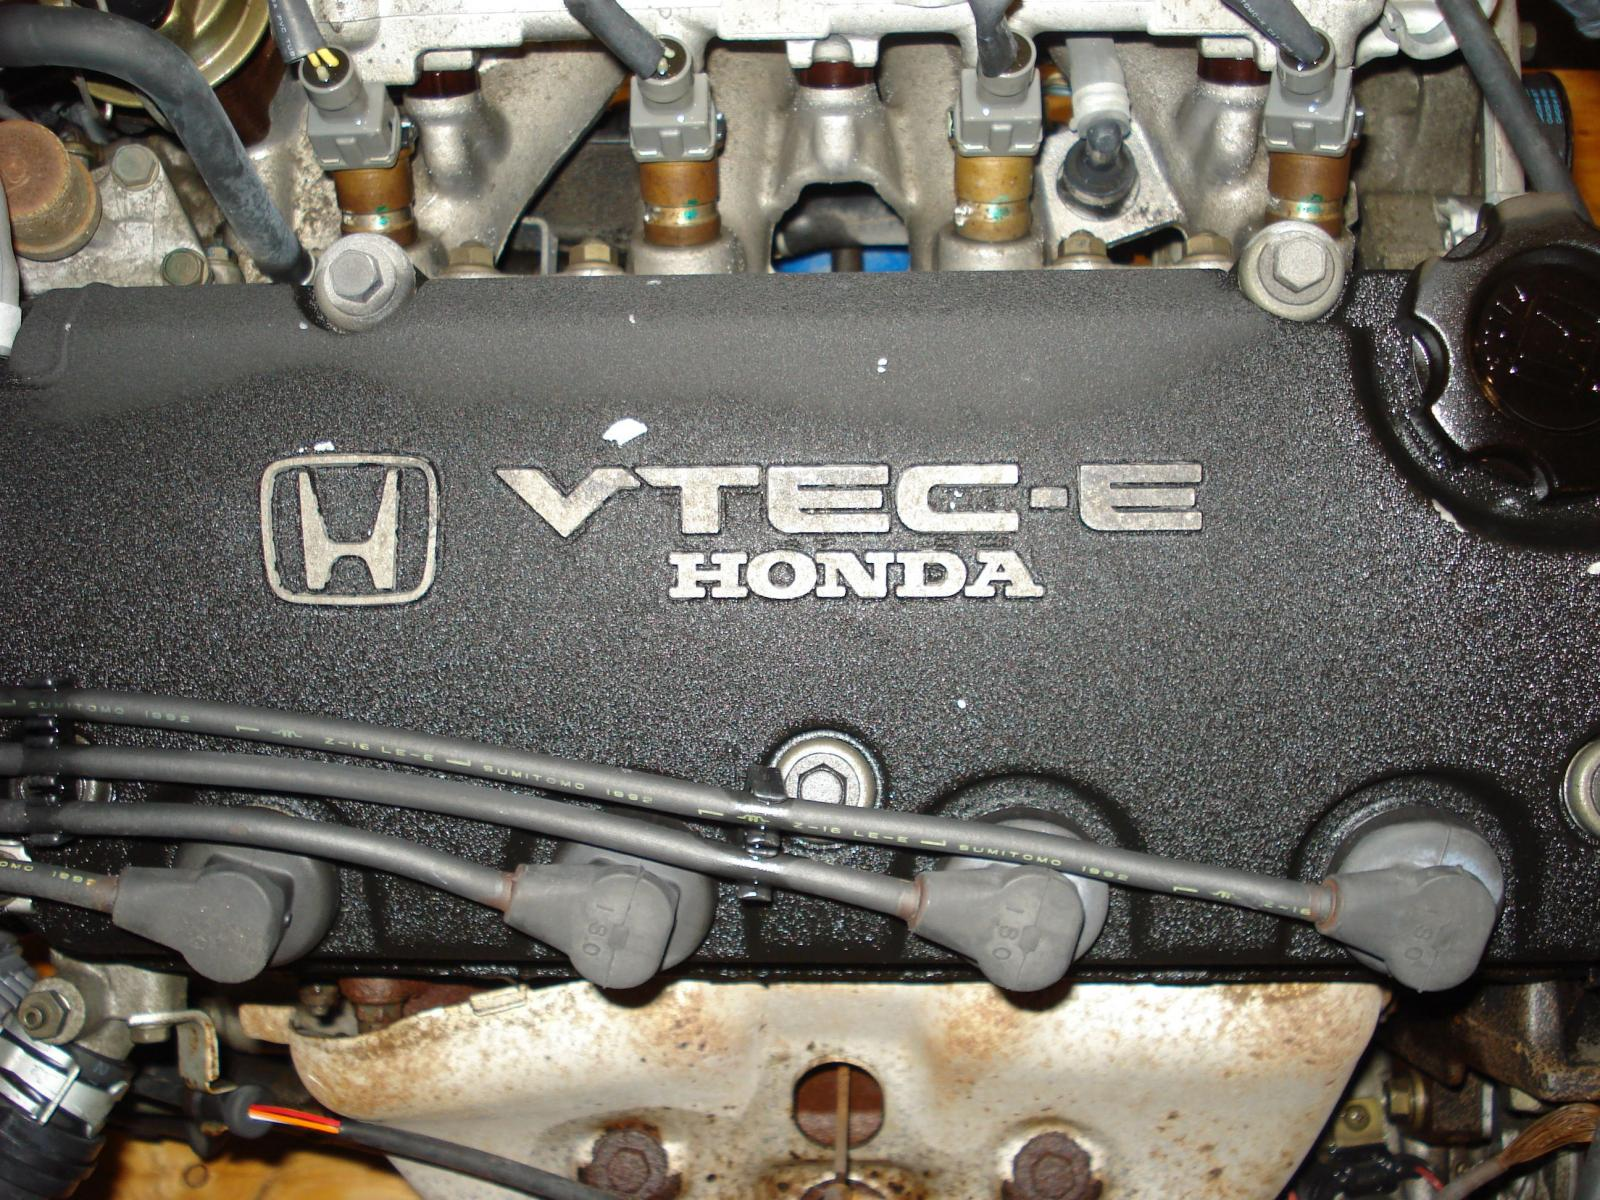 i VTEC vs VTEC: Honda VTEC-E